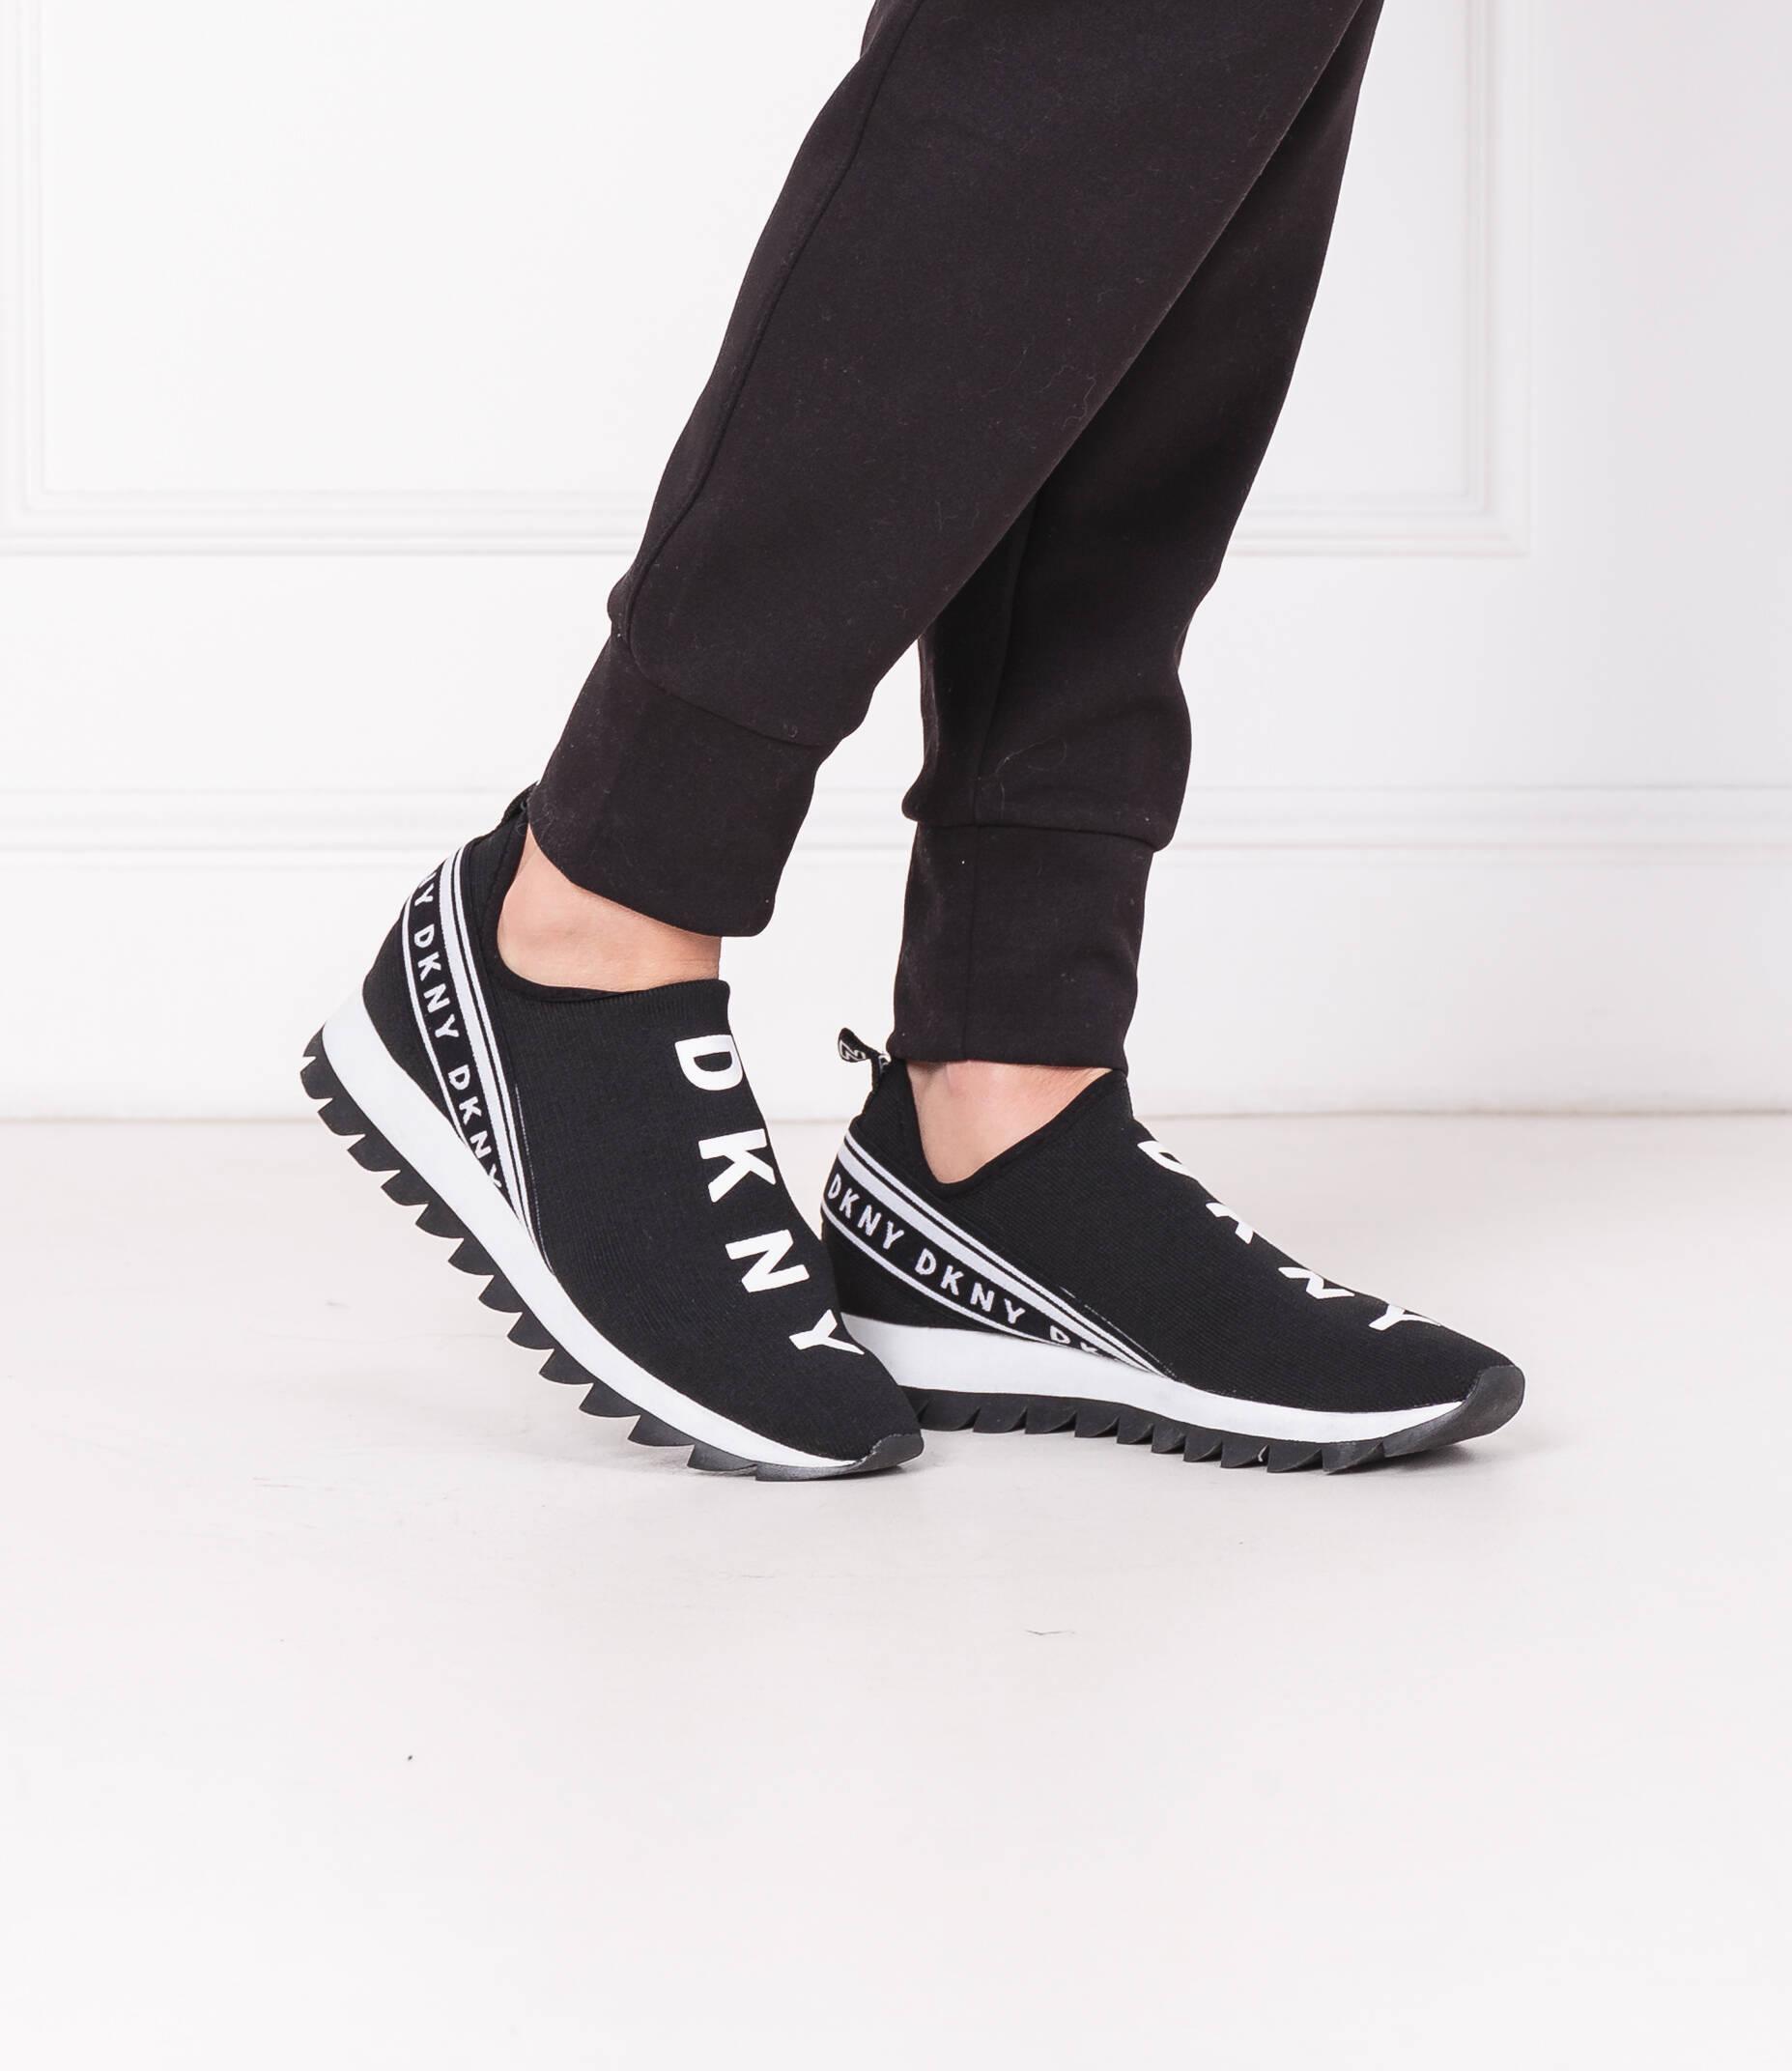 Sneakers abbi DKNY | Black | Gomez.pl/en